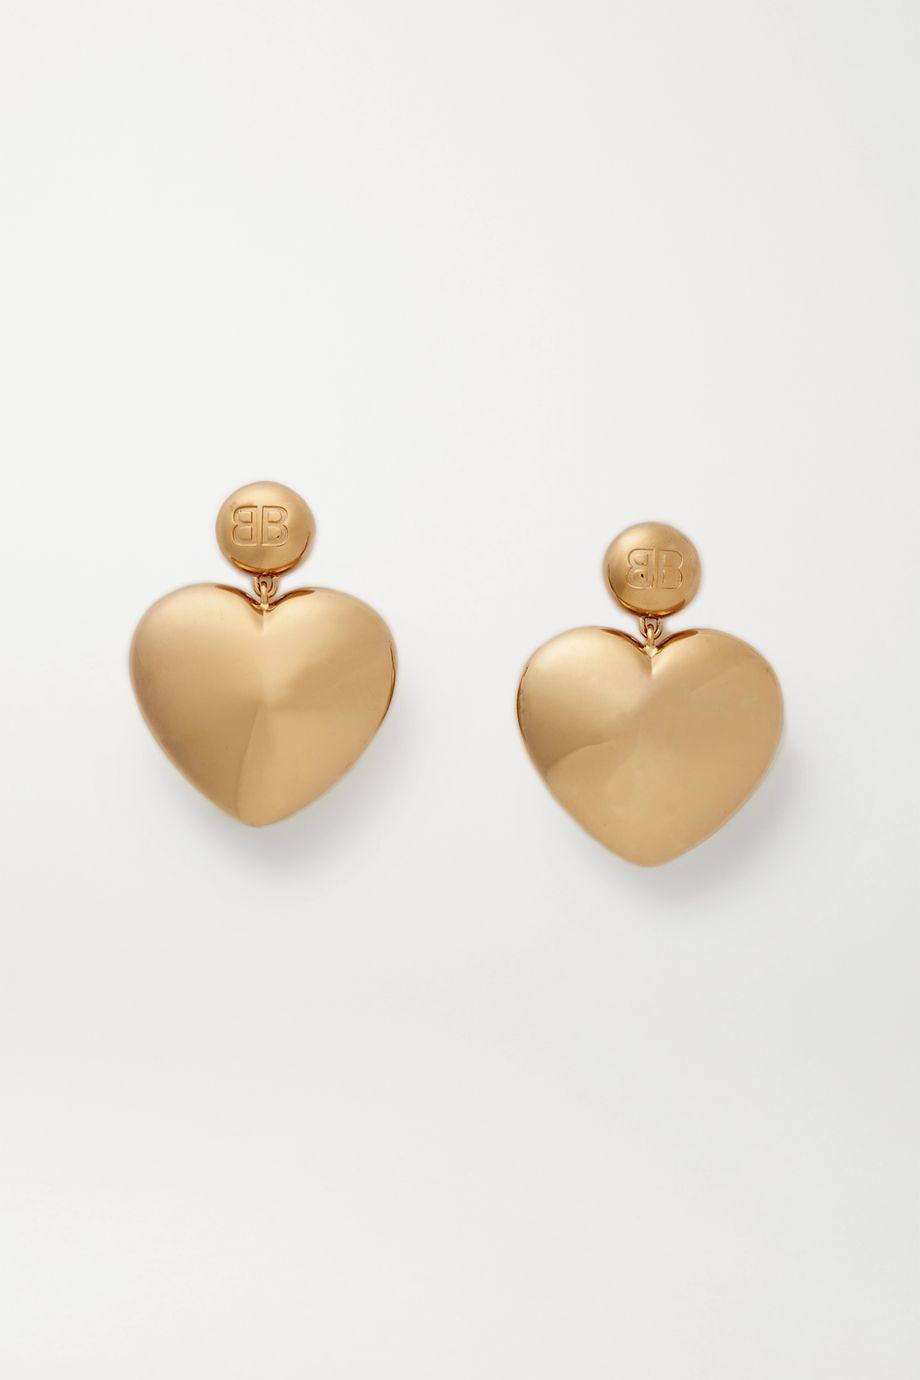 Balenciaga Susi gold-tone earrings